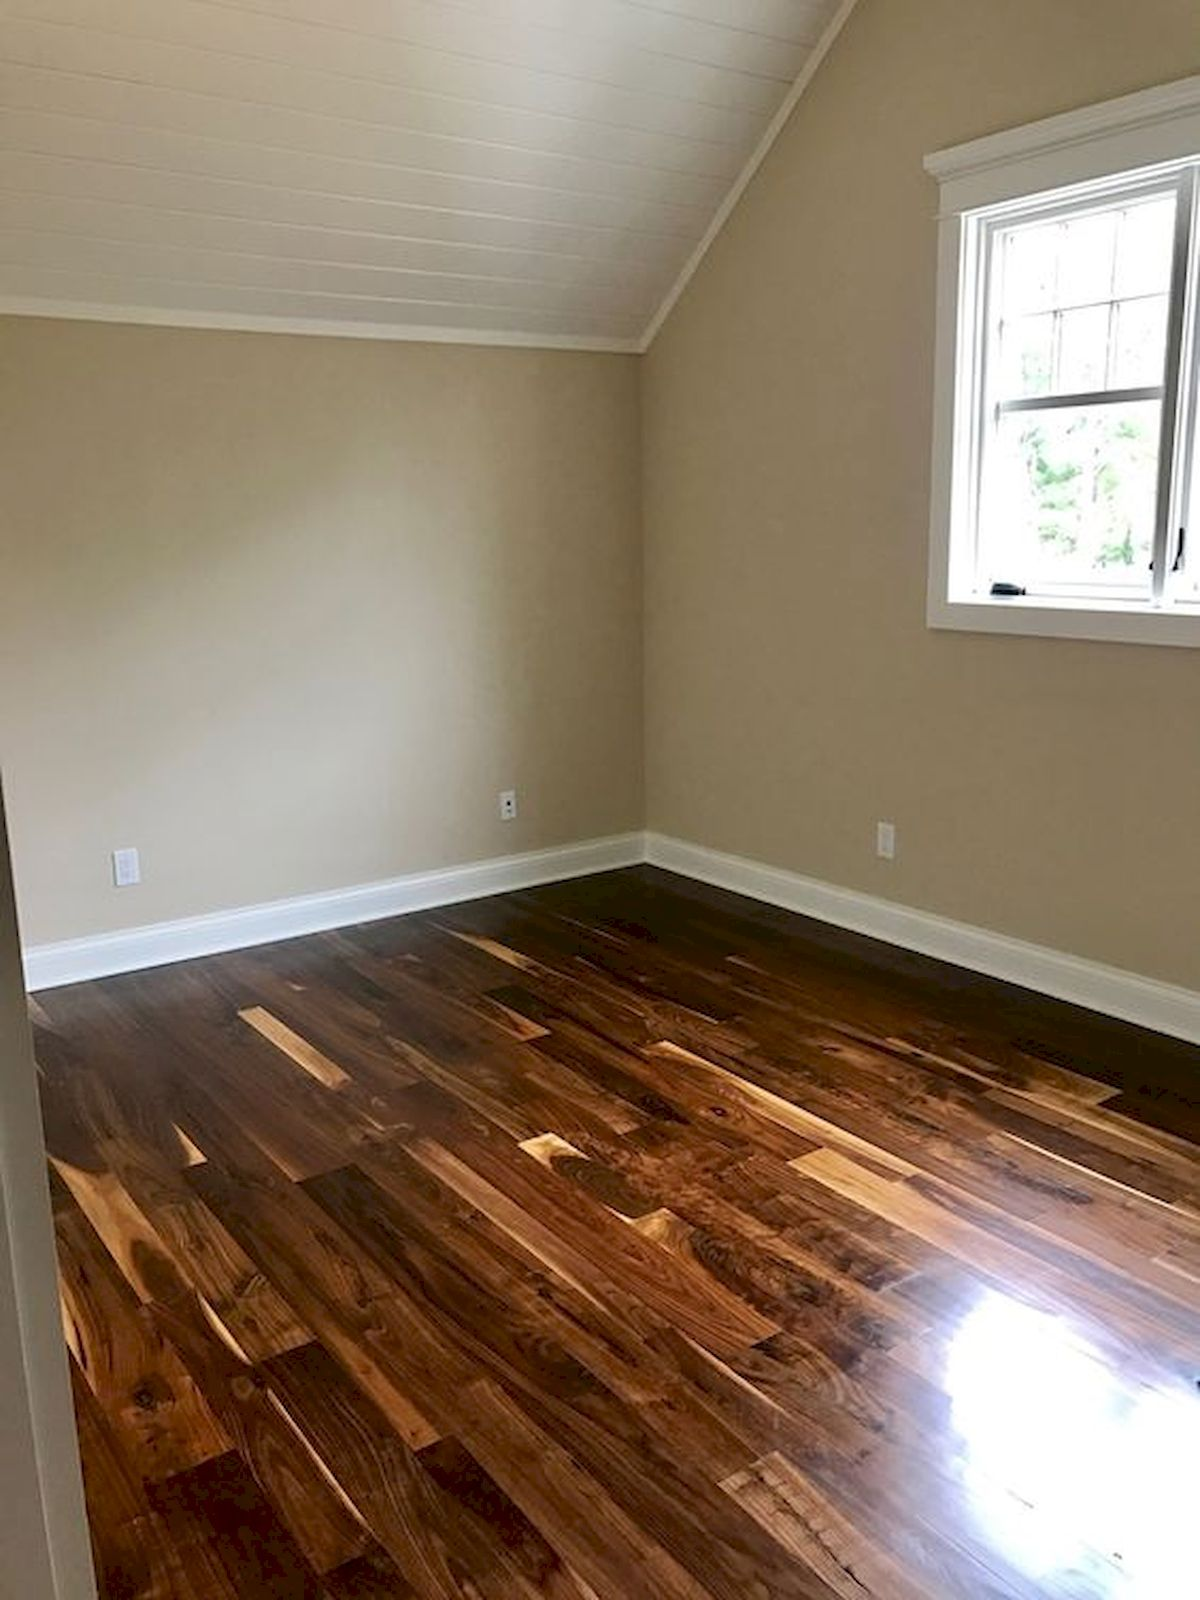 80 Gorgeous Hardwood Floor Ideas for Interior Home (46)